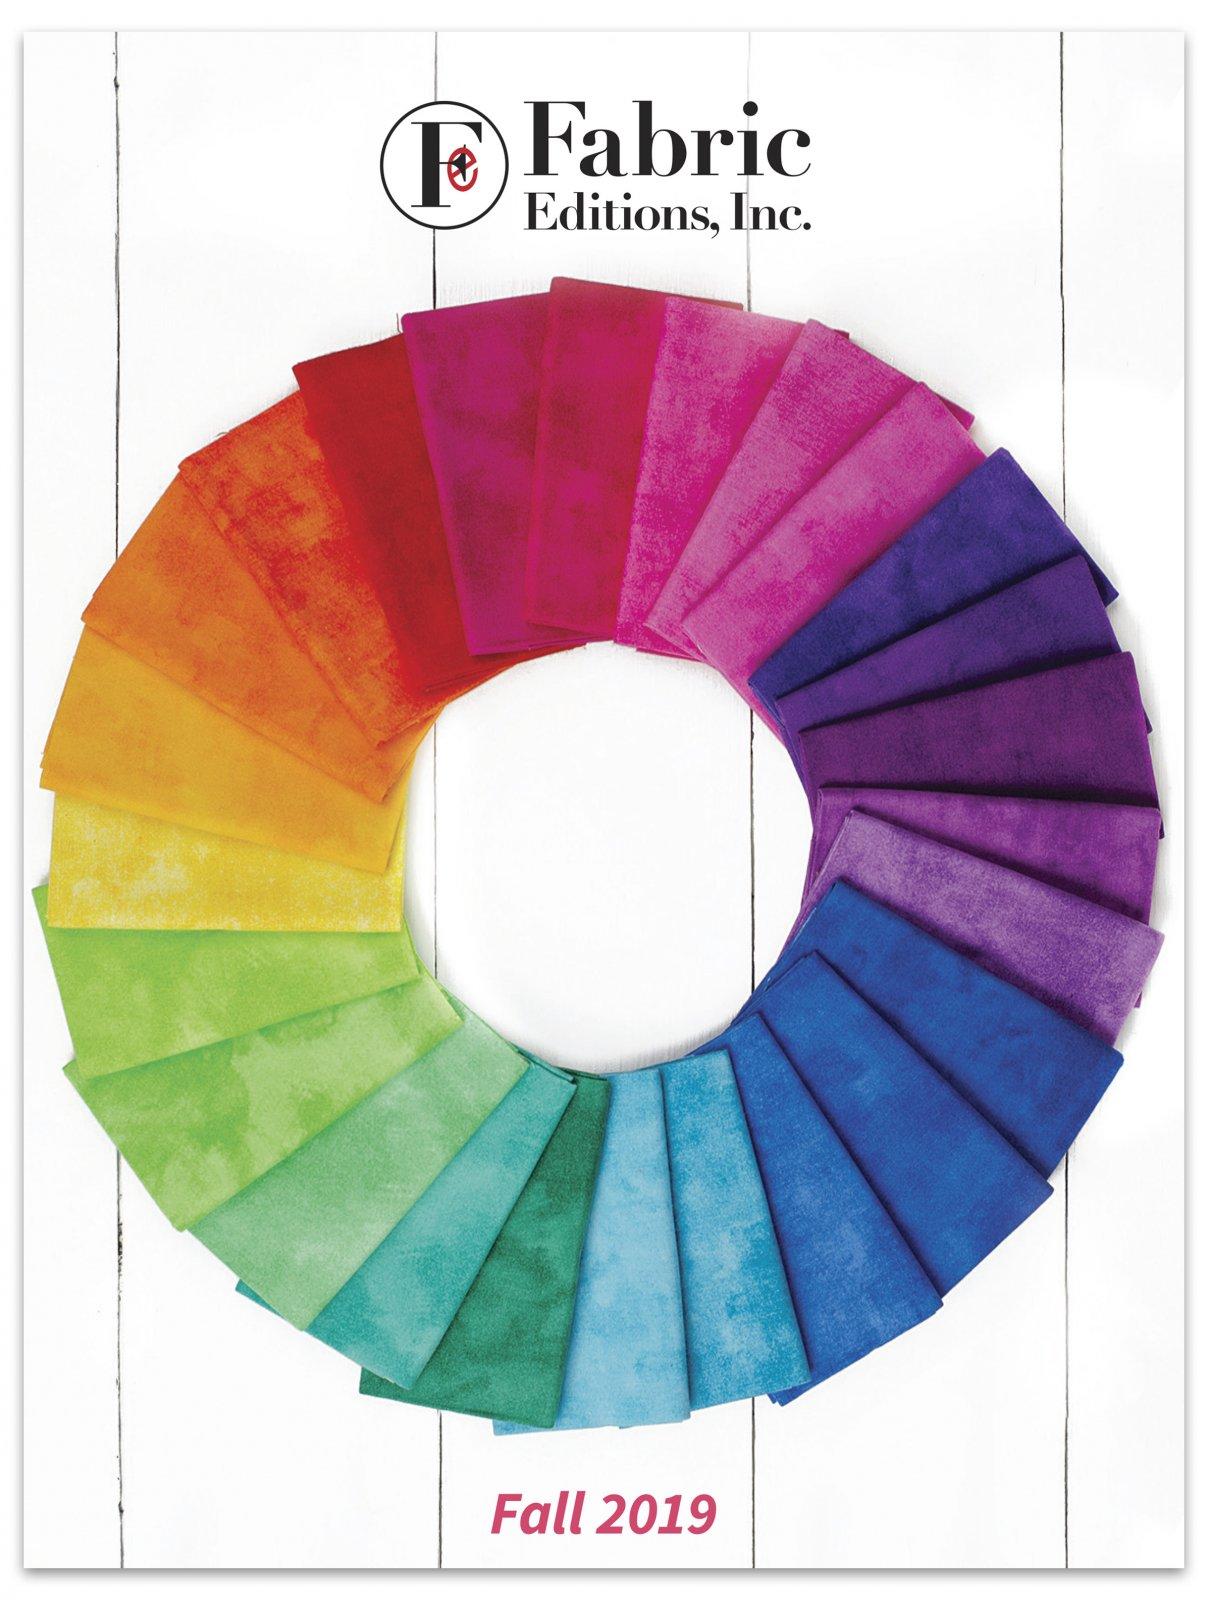 Fabric Editions Fall 2019 Fabric Catalog